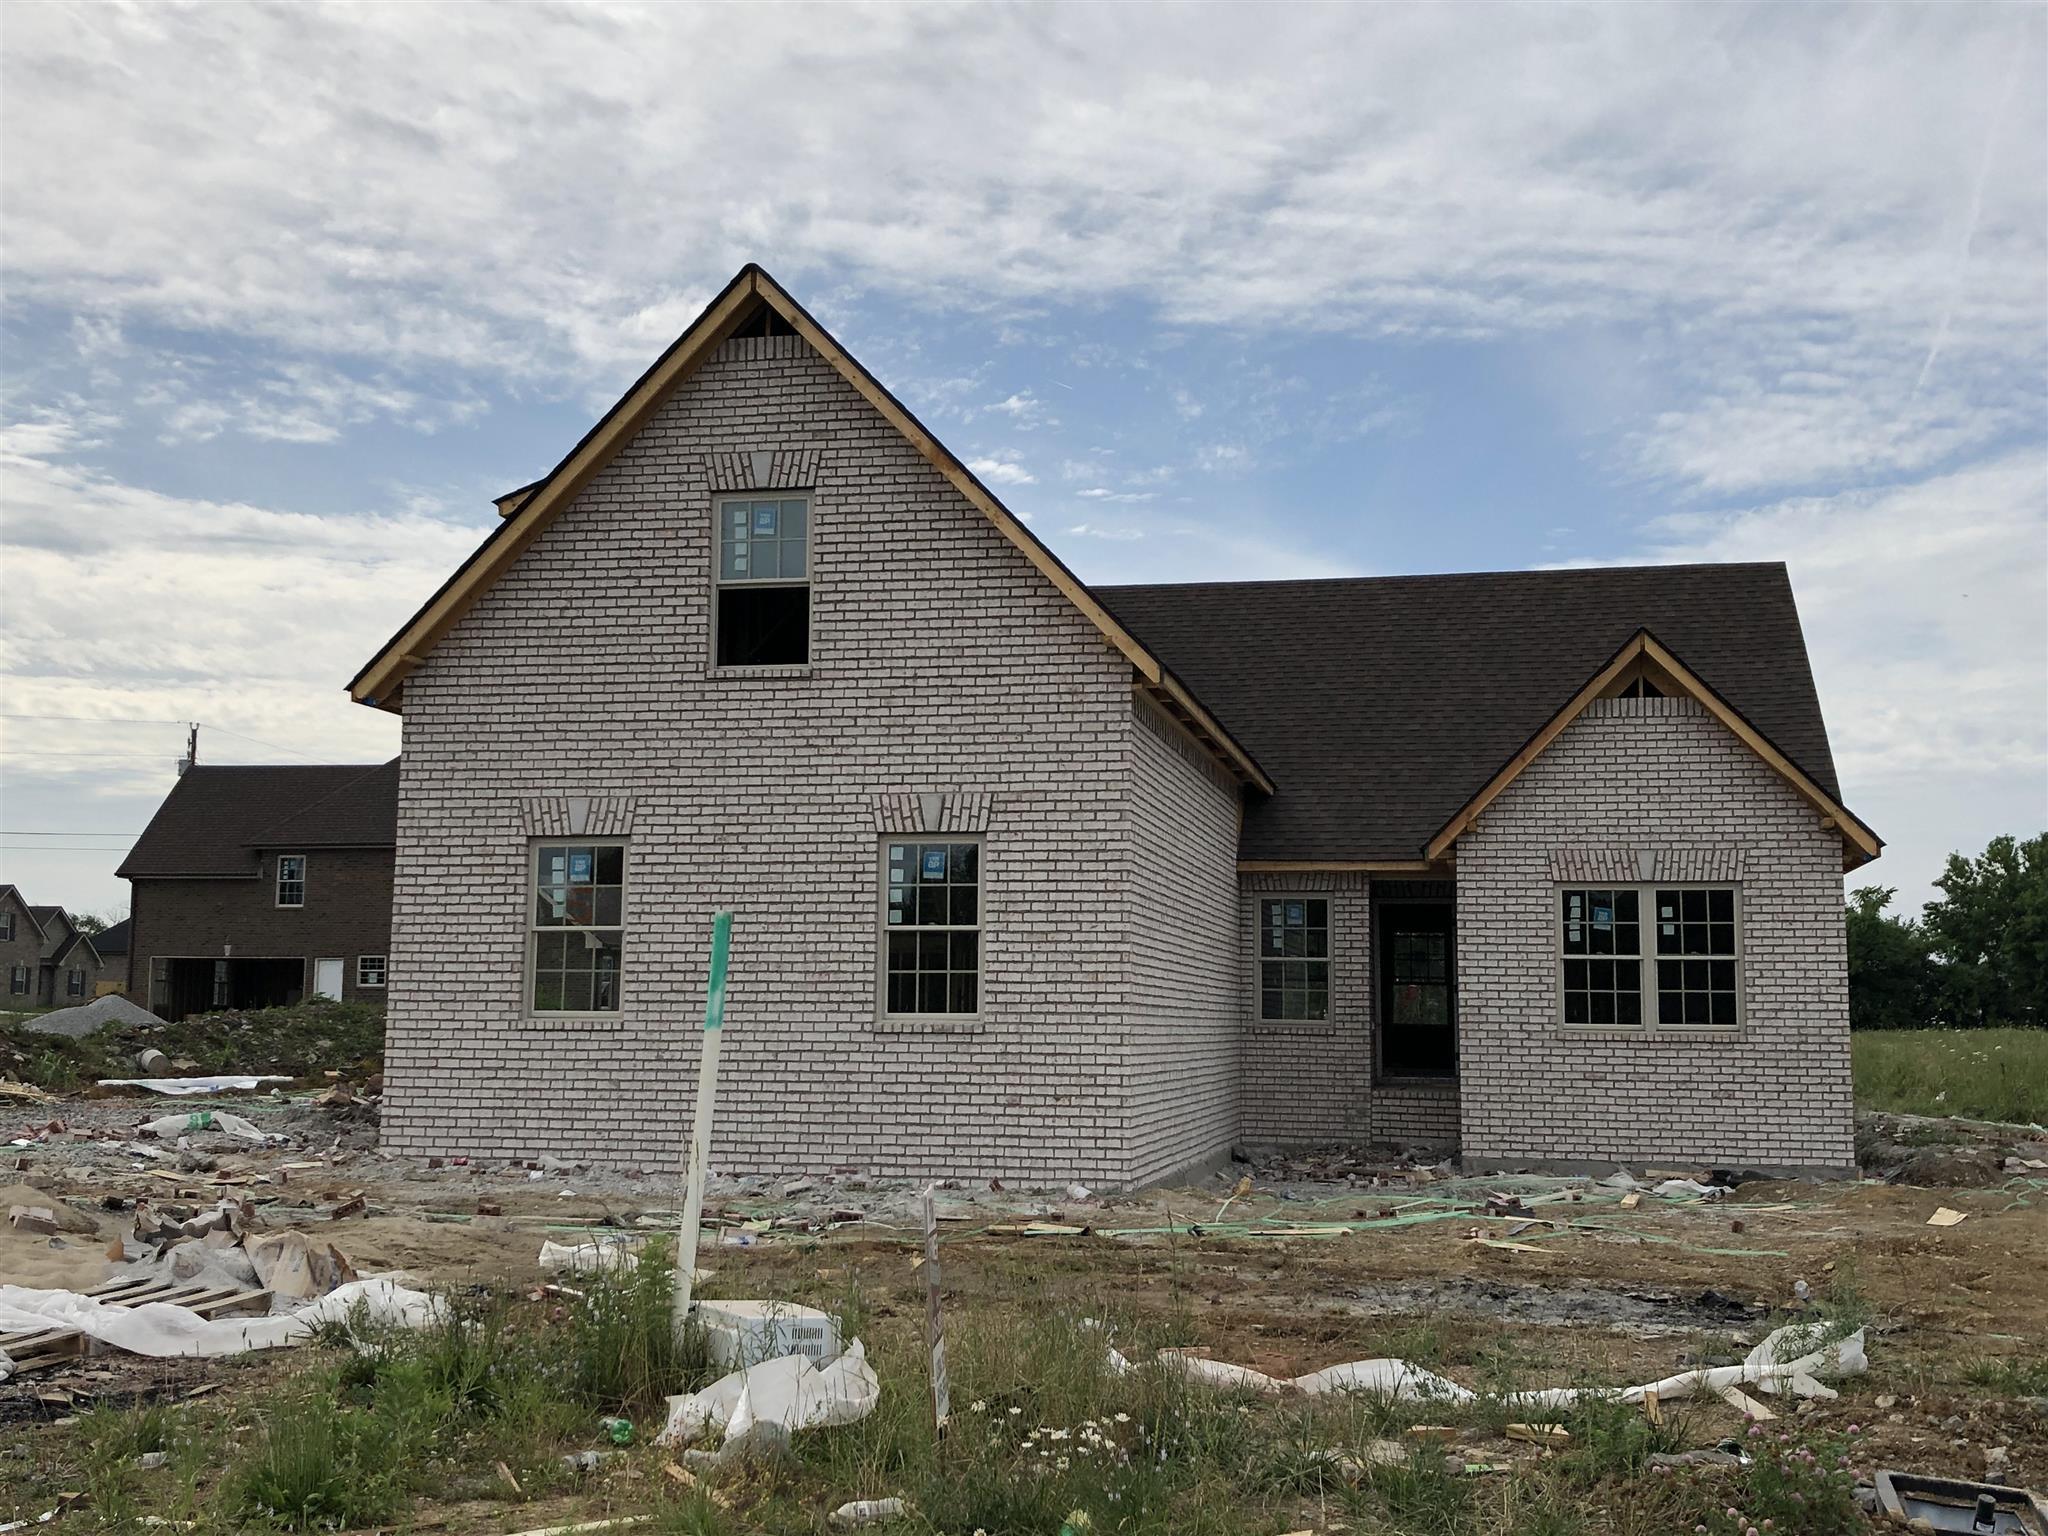 7706 Alameda Dr, Murfreesboro, TN 37127 - Murfreesboro, TN real estate listing